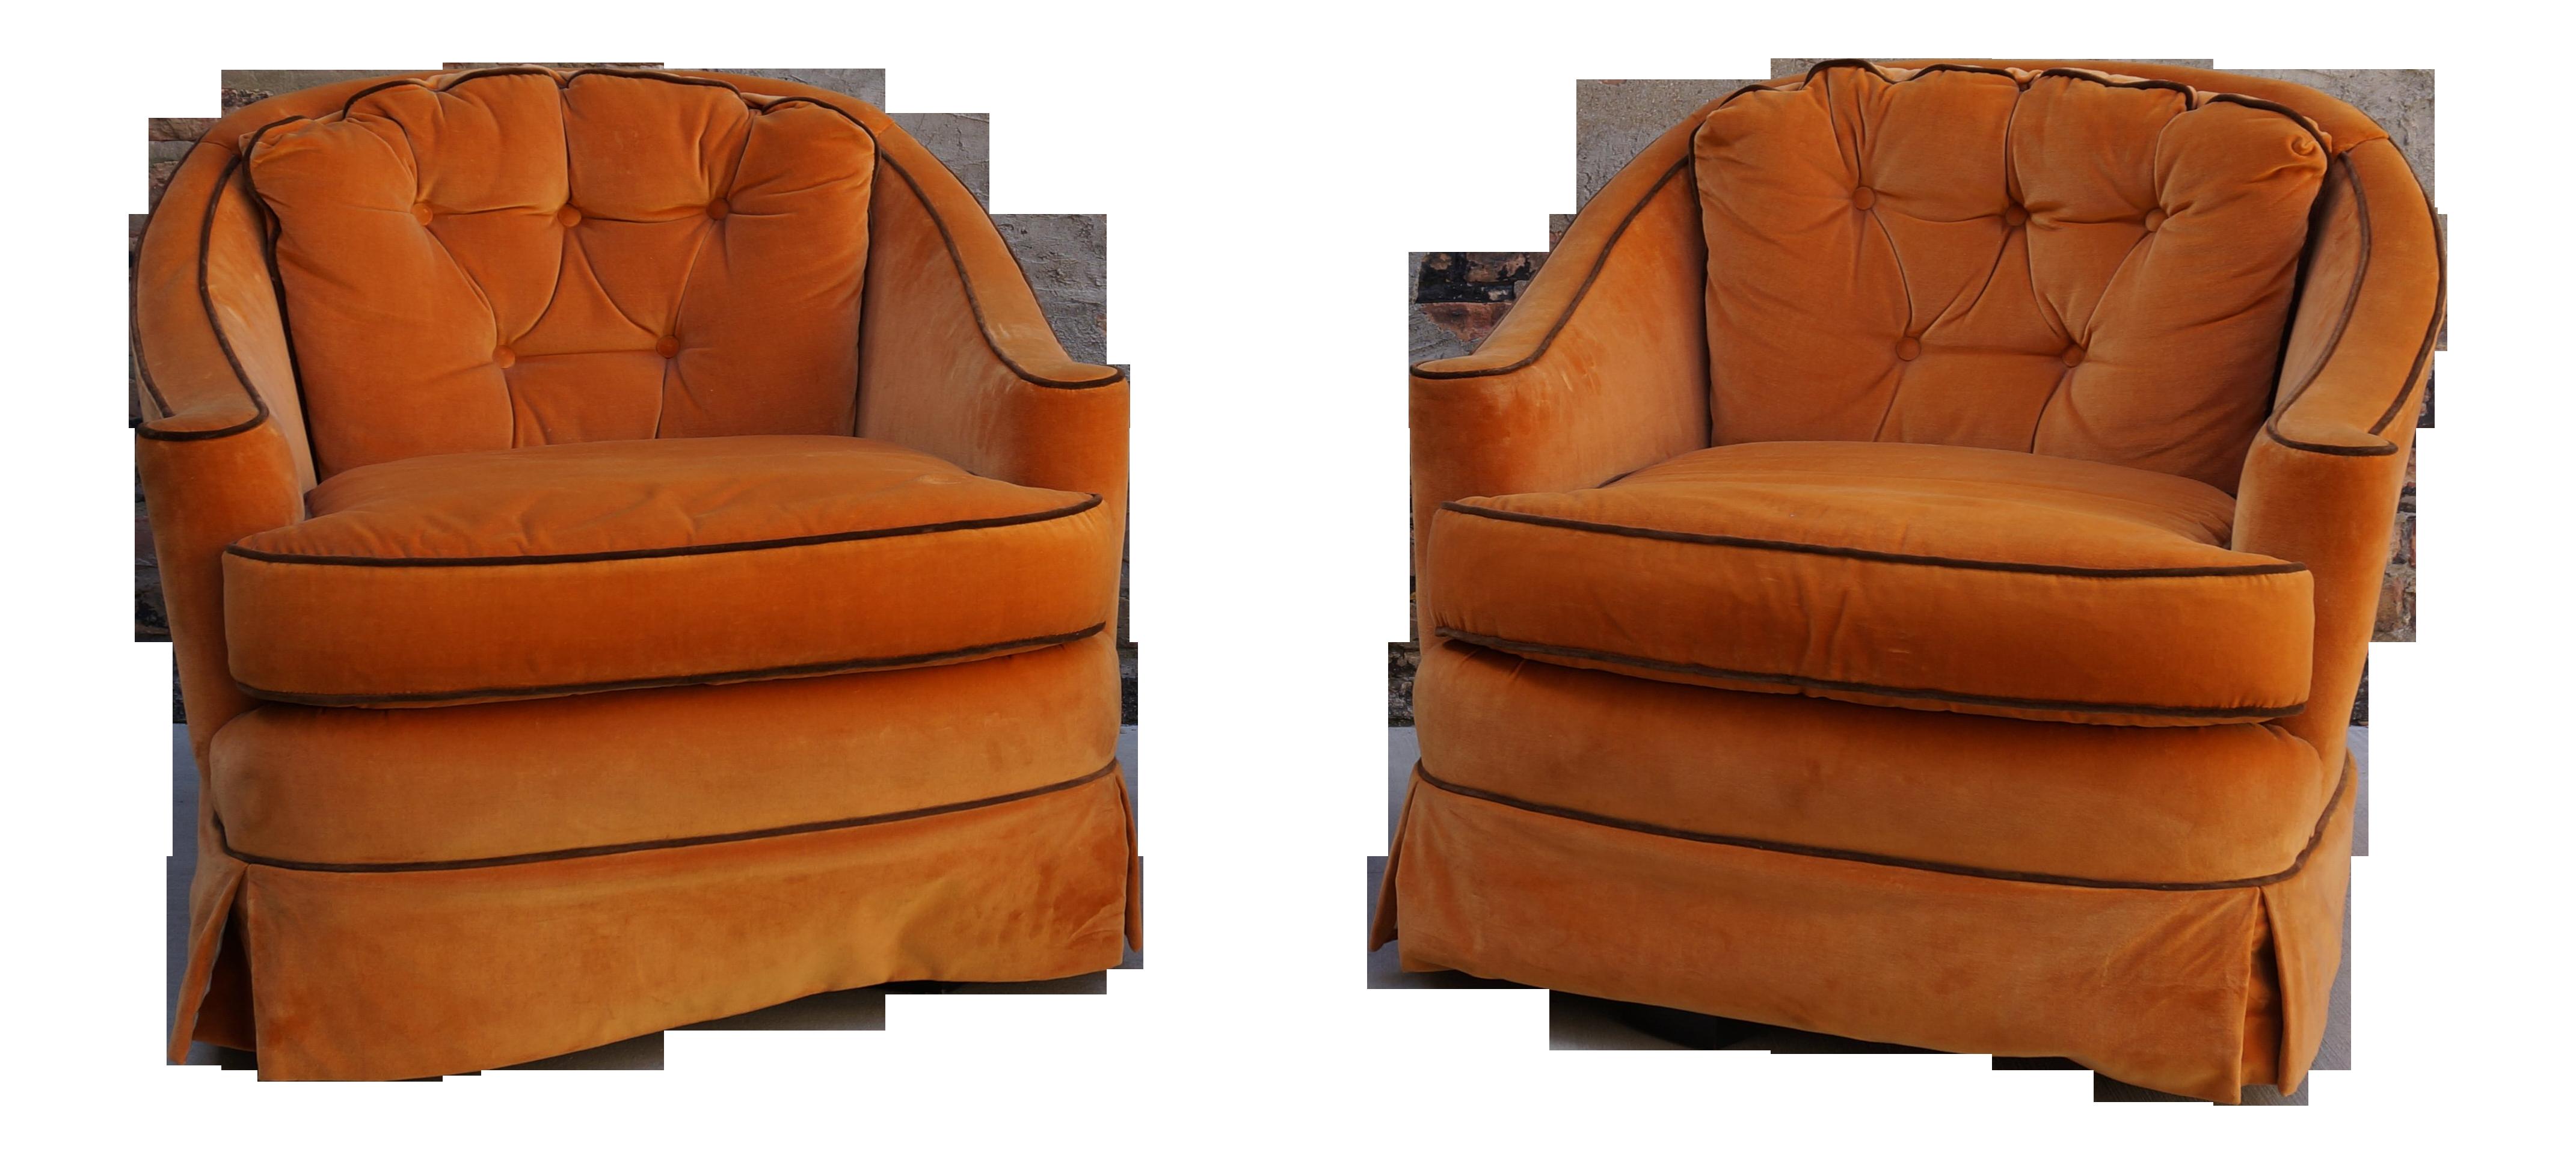 Mid Century Modern Erwin Lambeth Orange Velvet Lounge Chairs   A Pair